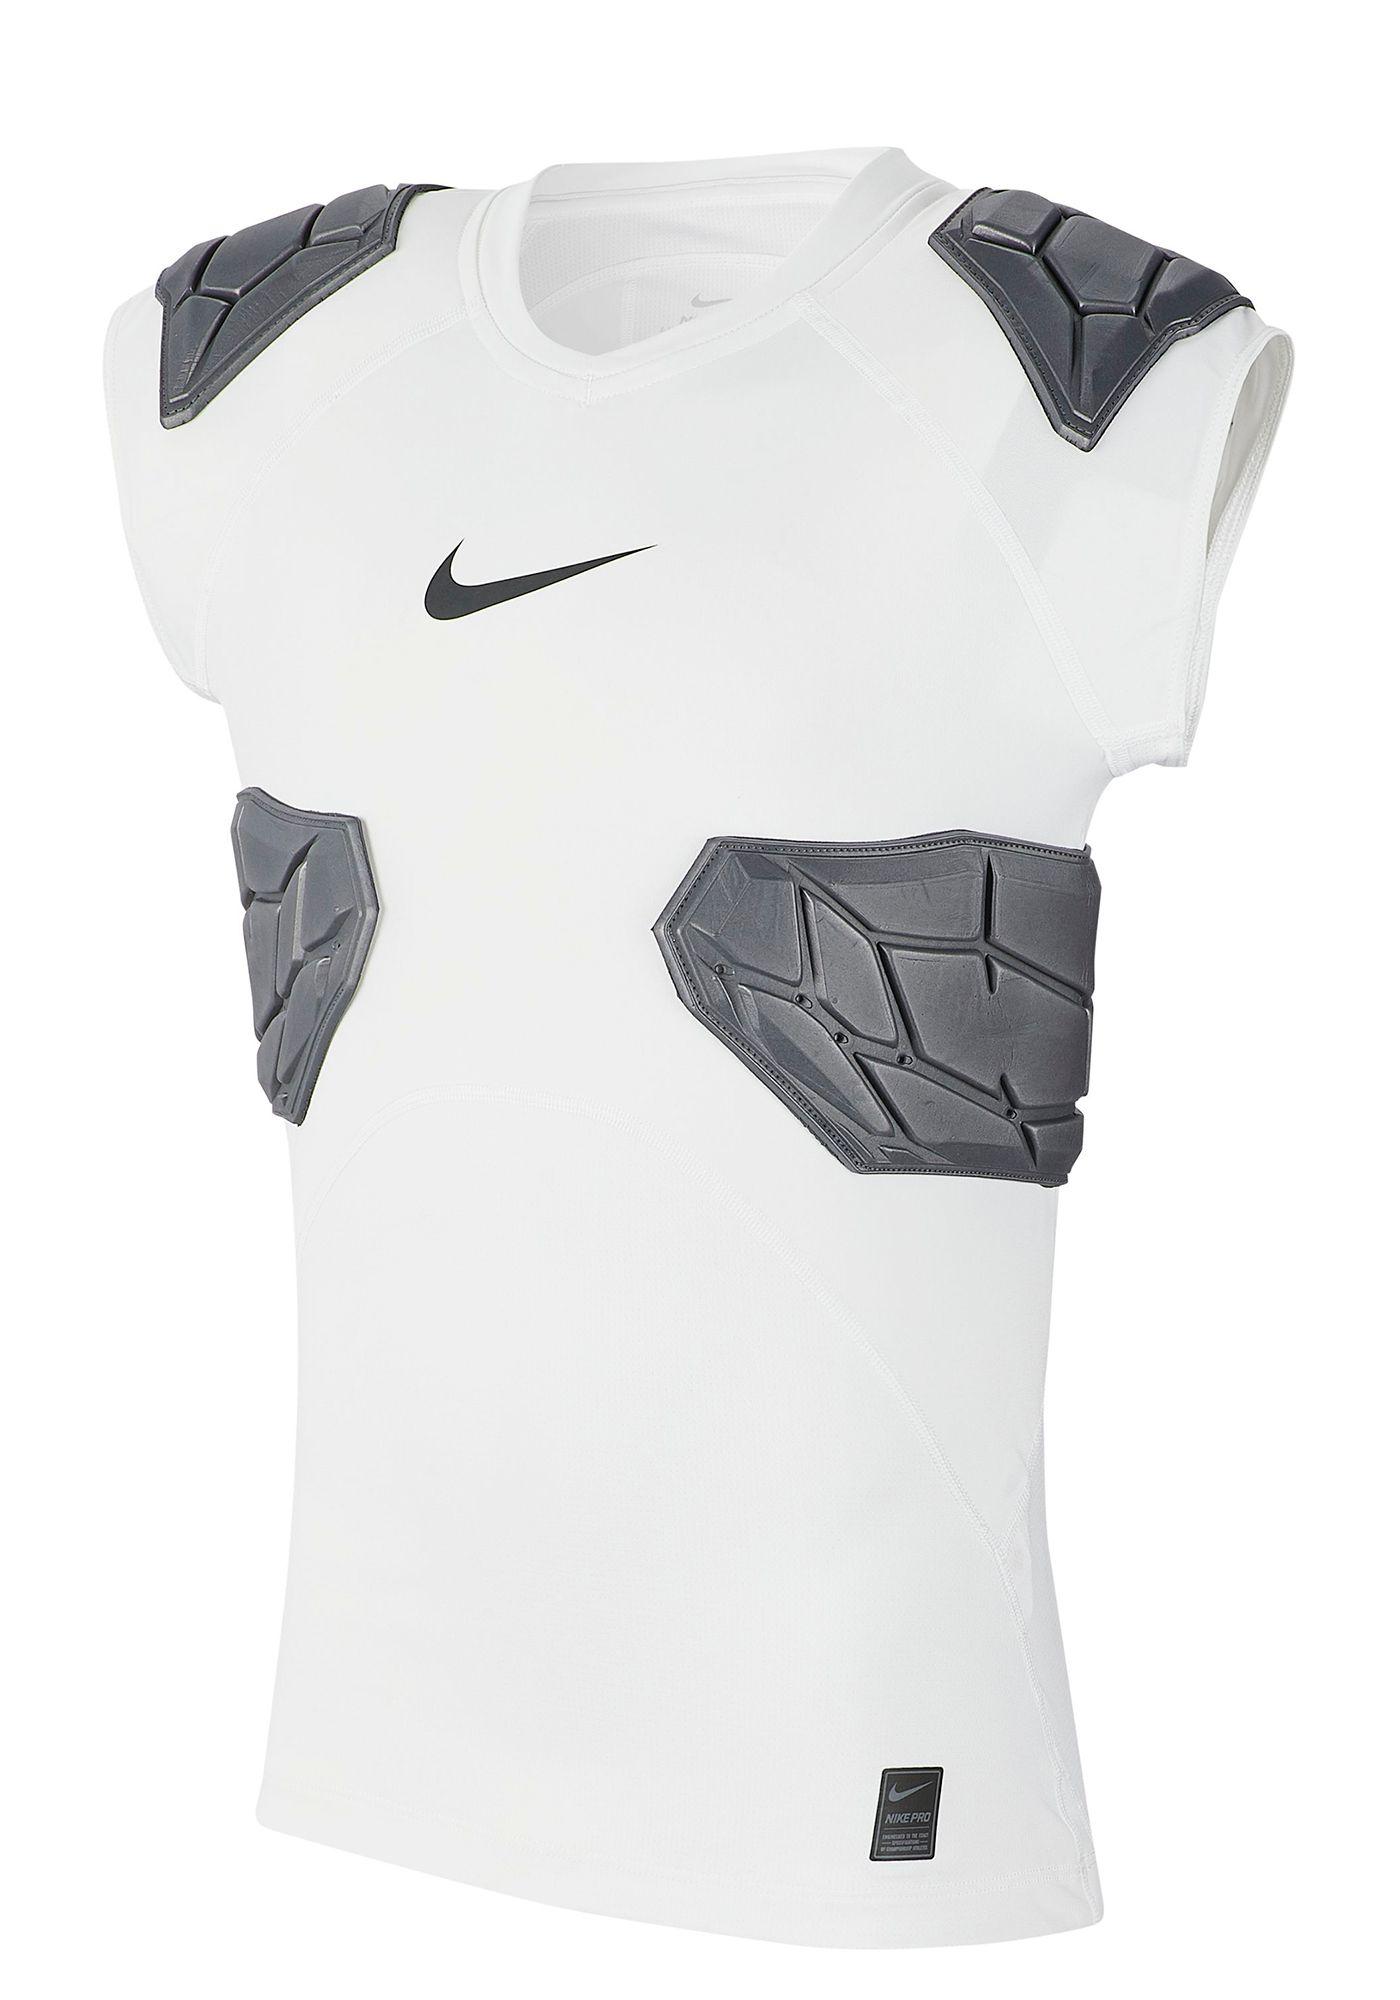 Nike Youth Pro Hyperstrong Sleeveless Football Shirt